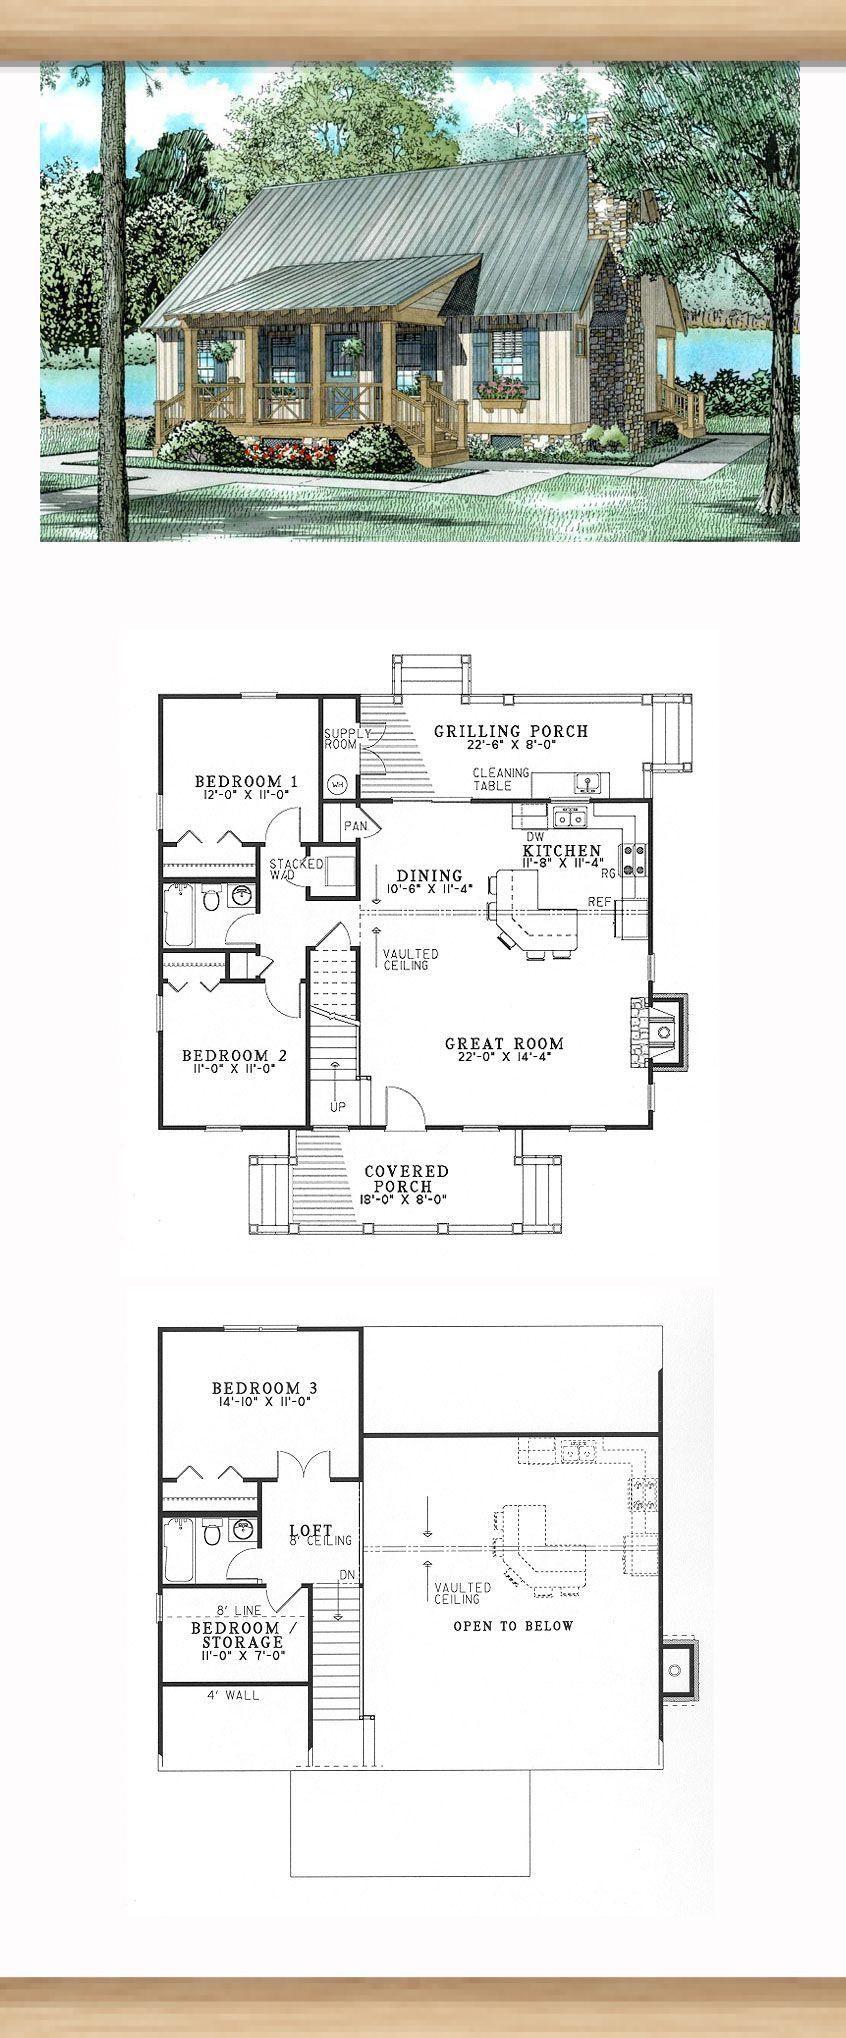 Plano De La Casa 62115 En Estilo Sureno Con 3 Camas 2 Banos Banos Camas Casa Con Estilo Plano Su Basement House Plans Hillside House Small House Plans